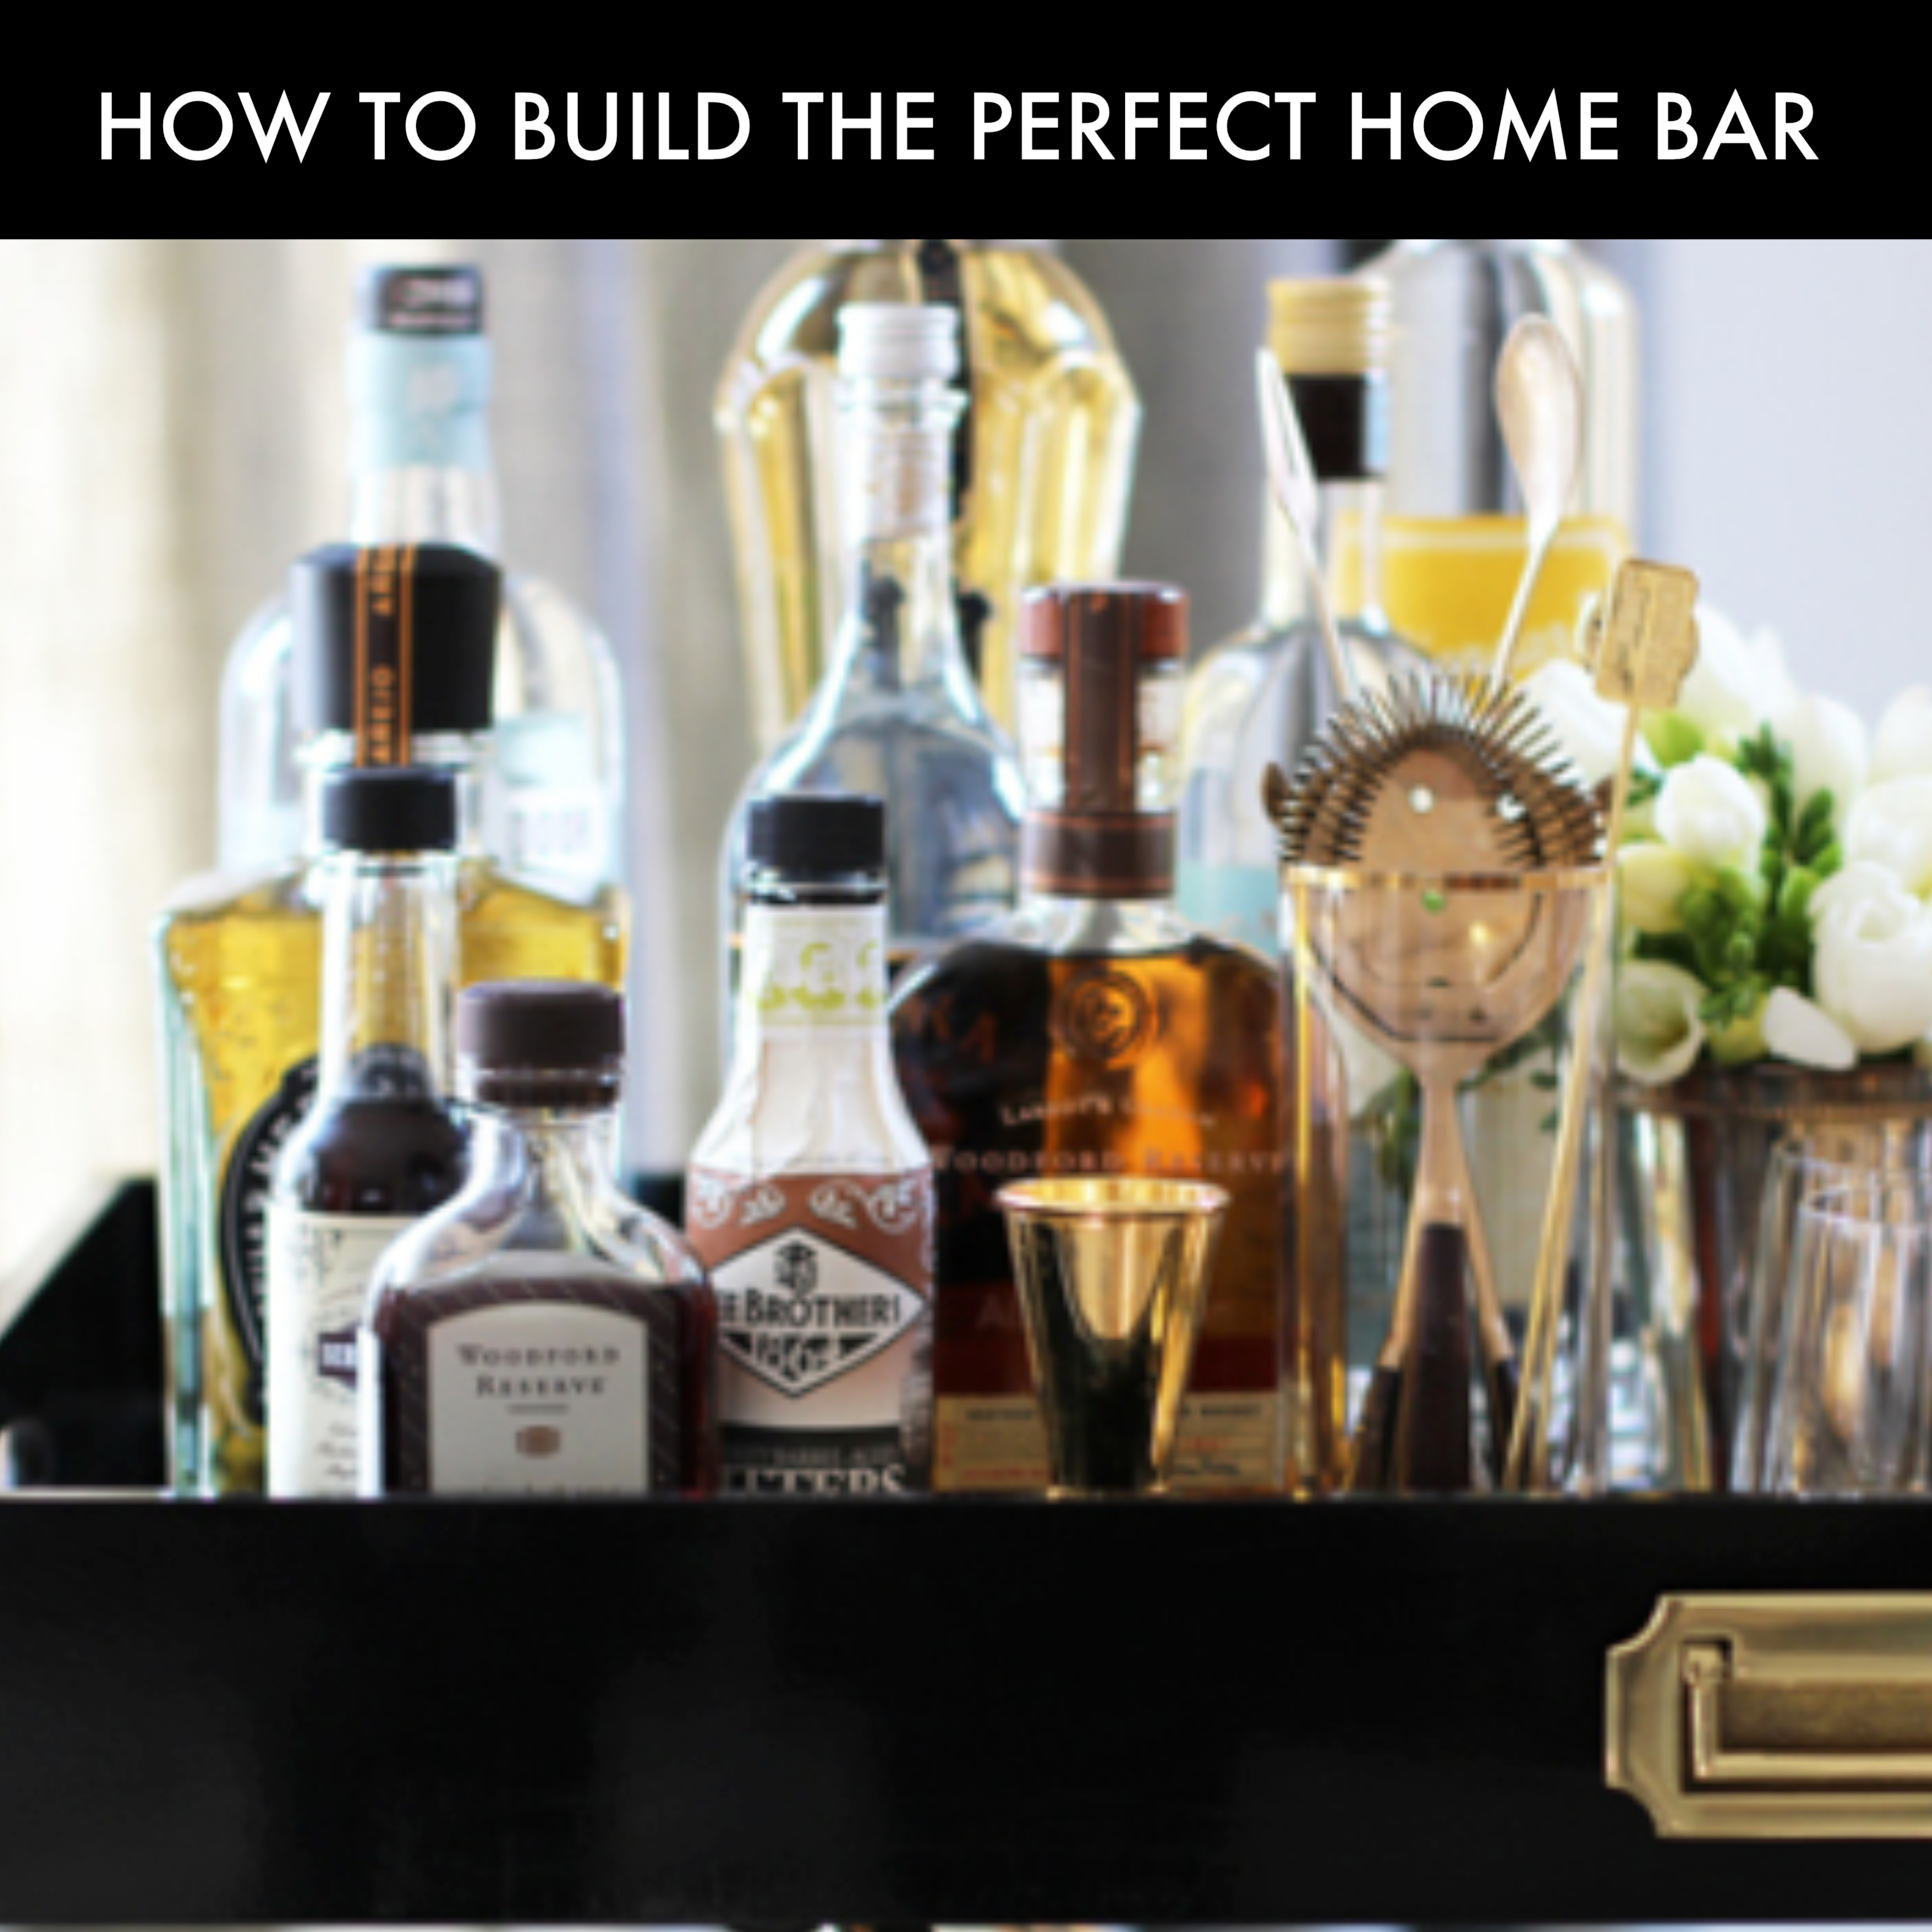 home bar_thumb.png